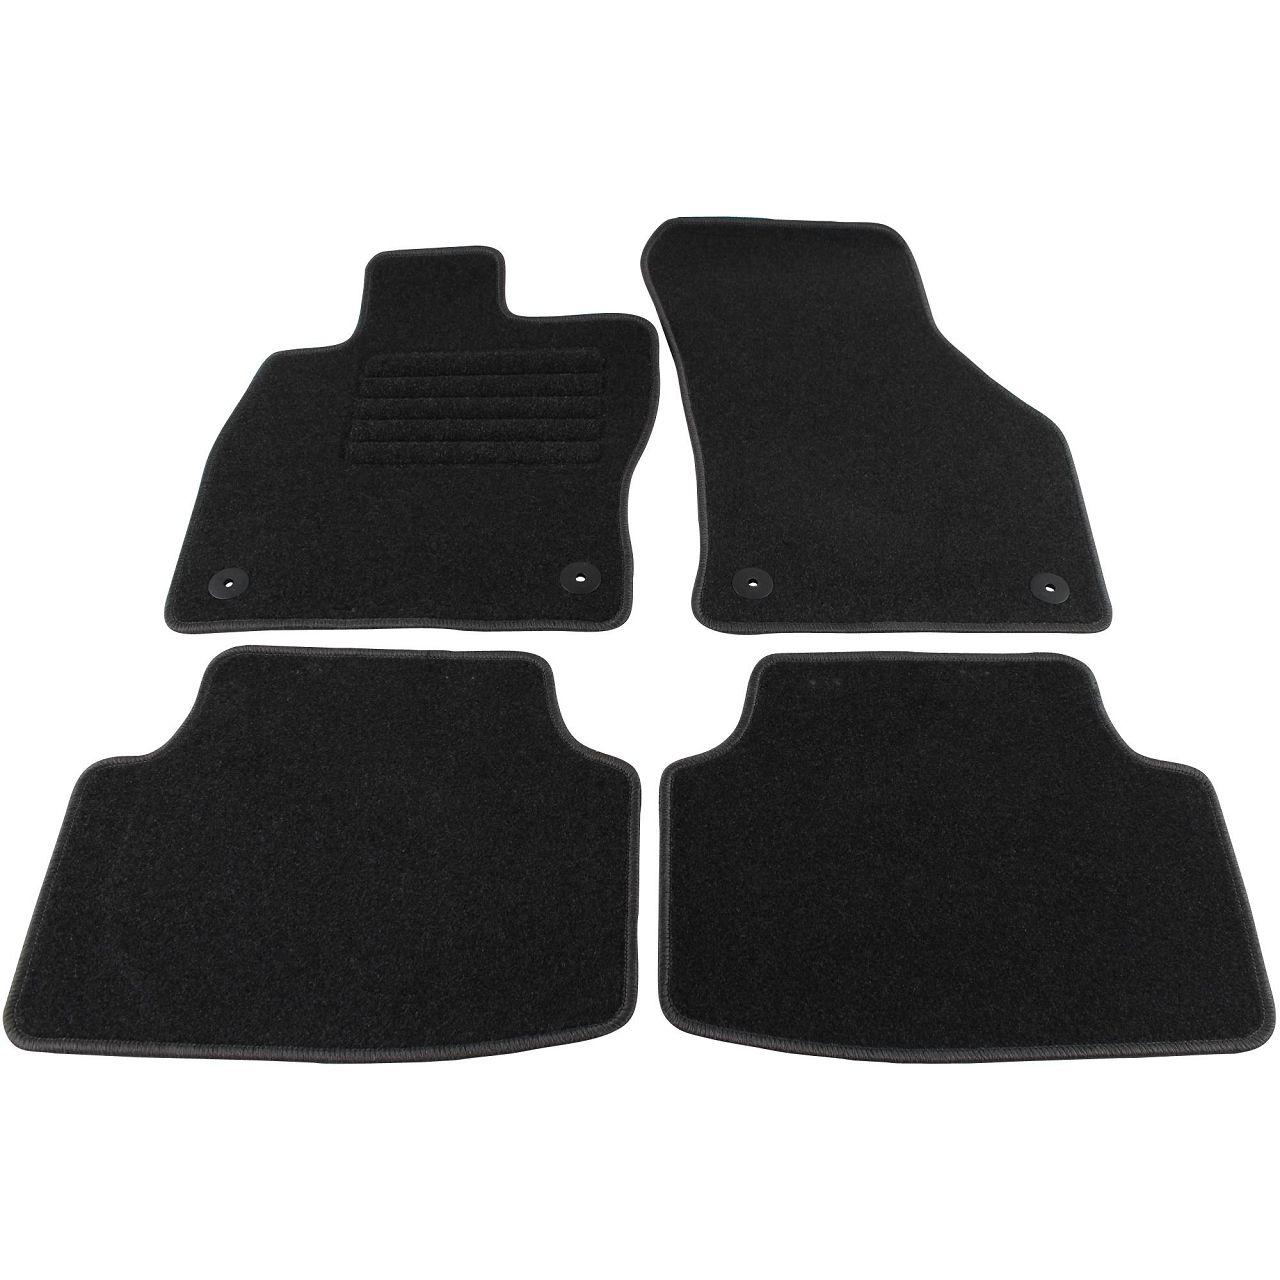 SCHÖNEK Veloursmatten Textilmatten Fußmatten SKODA Octavia 3 5E Combi ab 05.2013 4-teilig